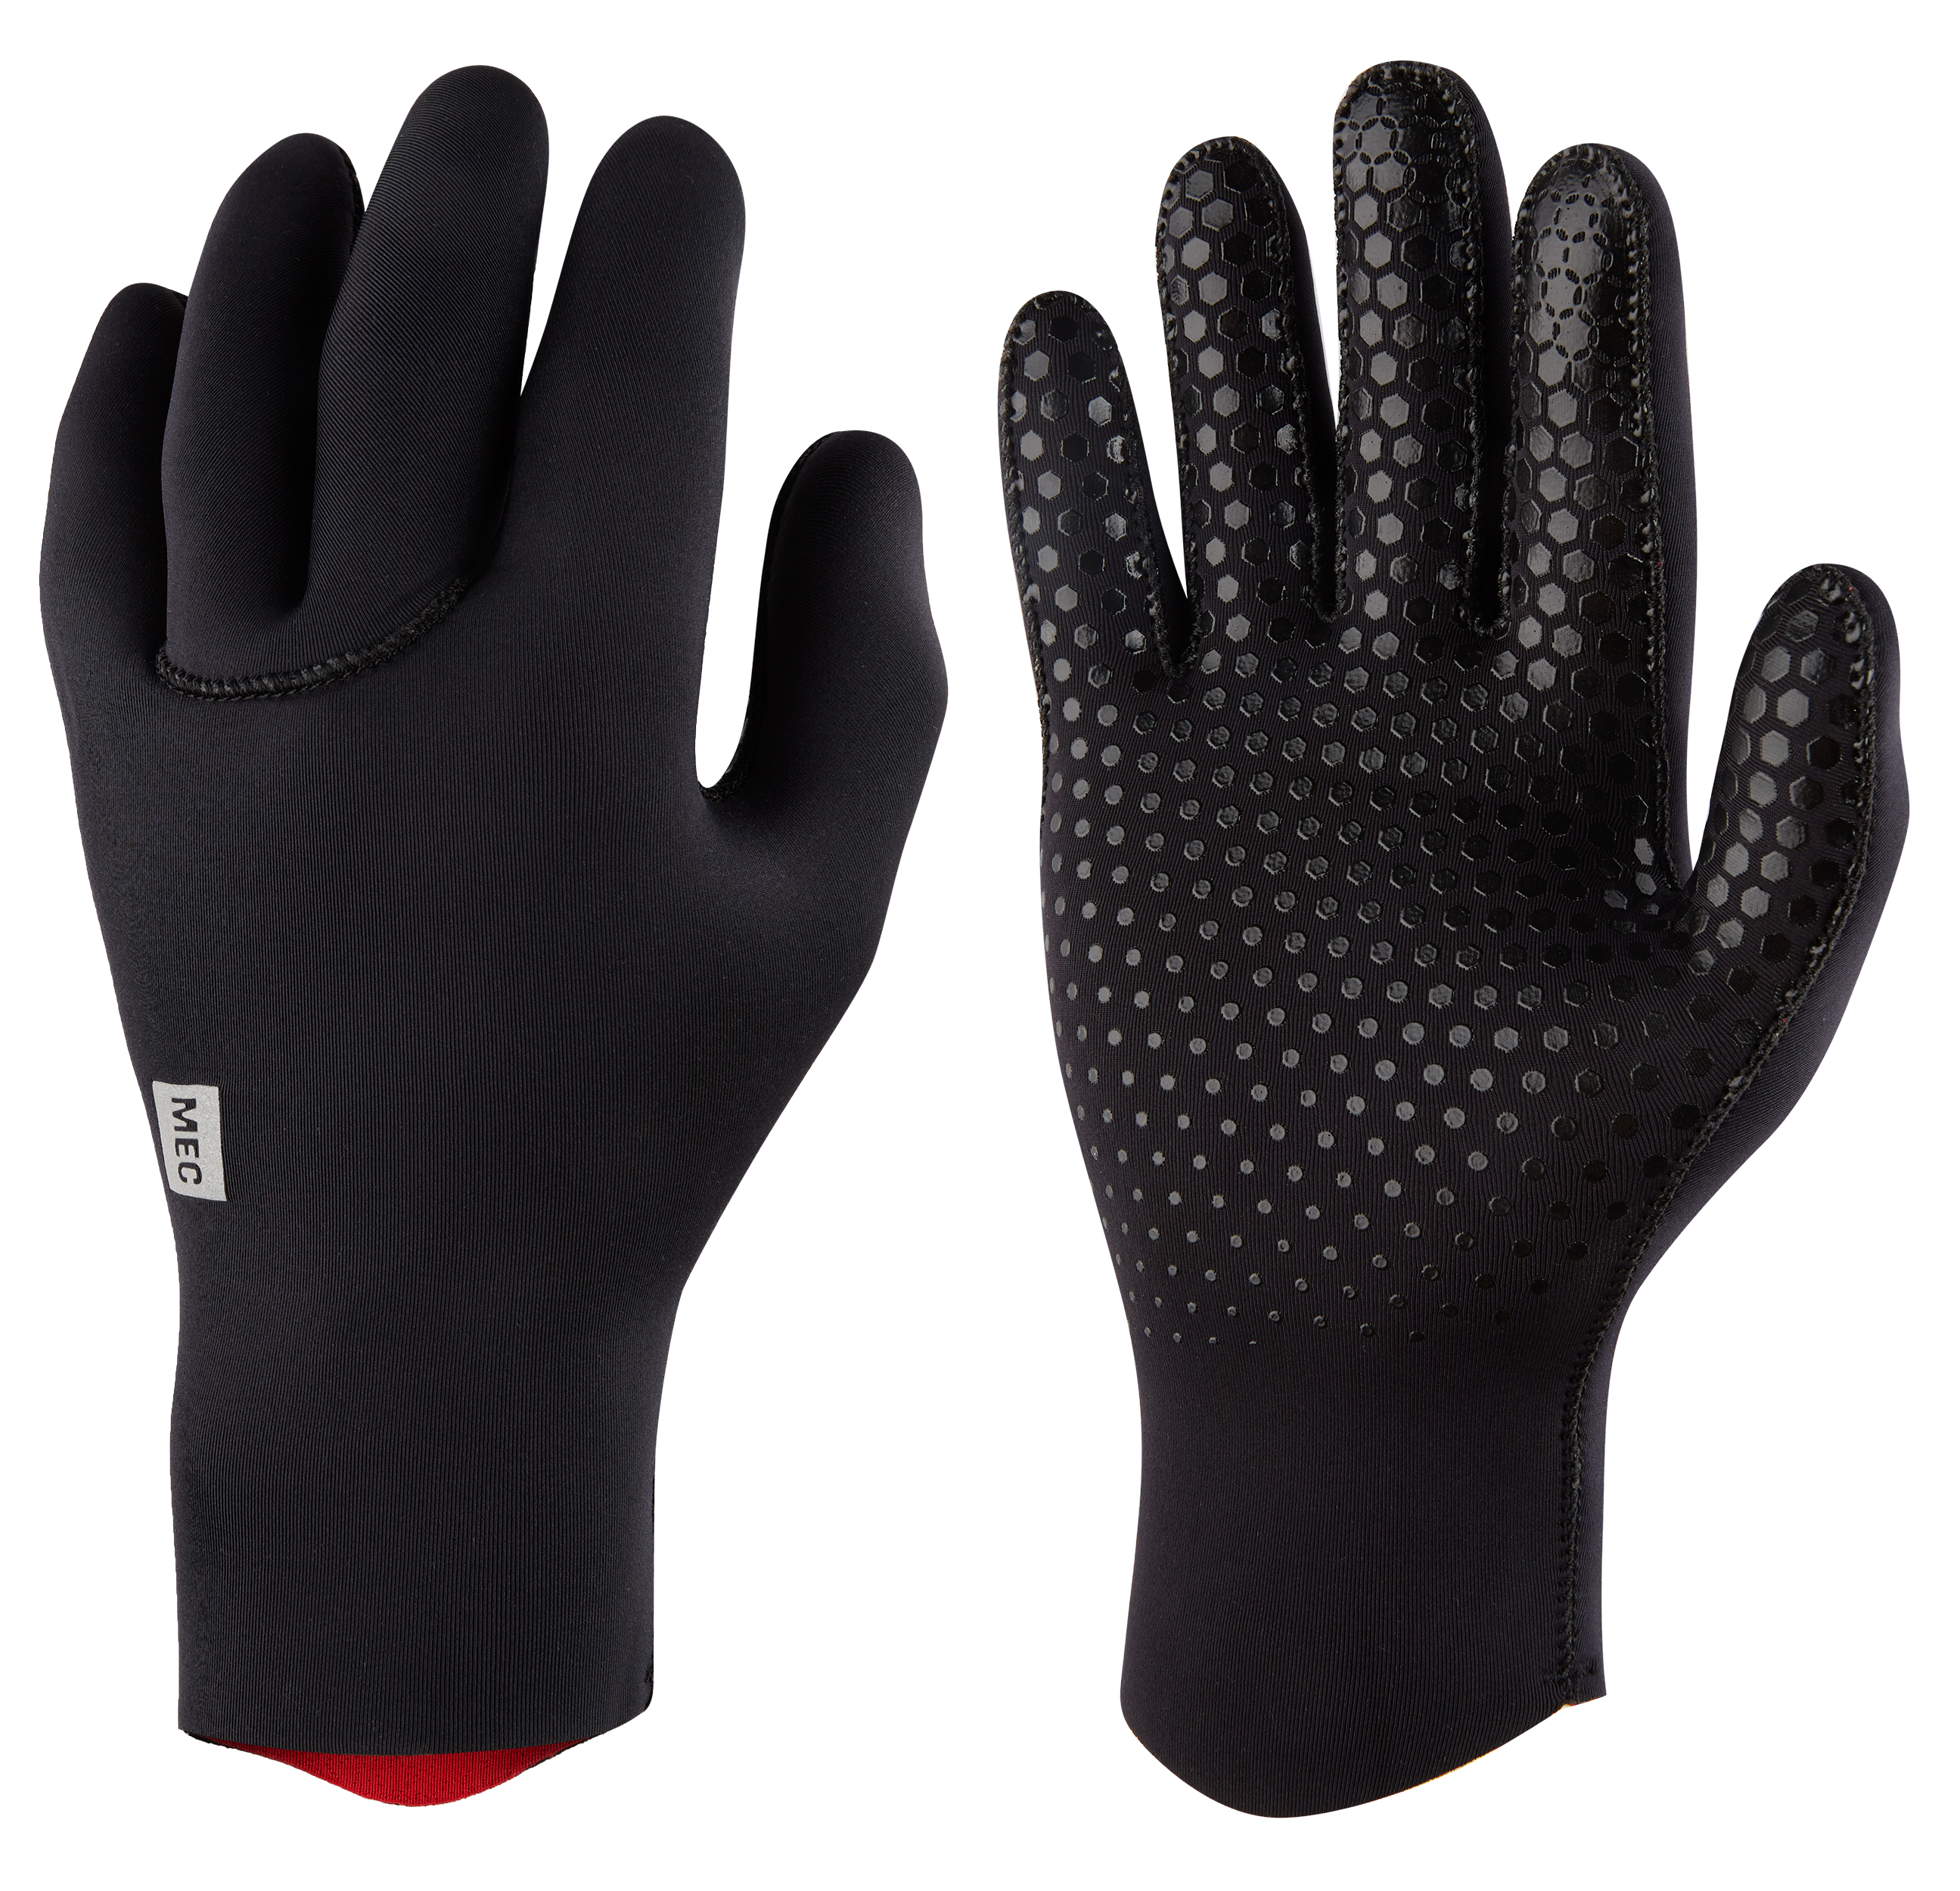 Castelli s tre 1 gloves black&white sexual orientation